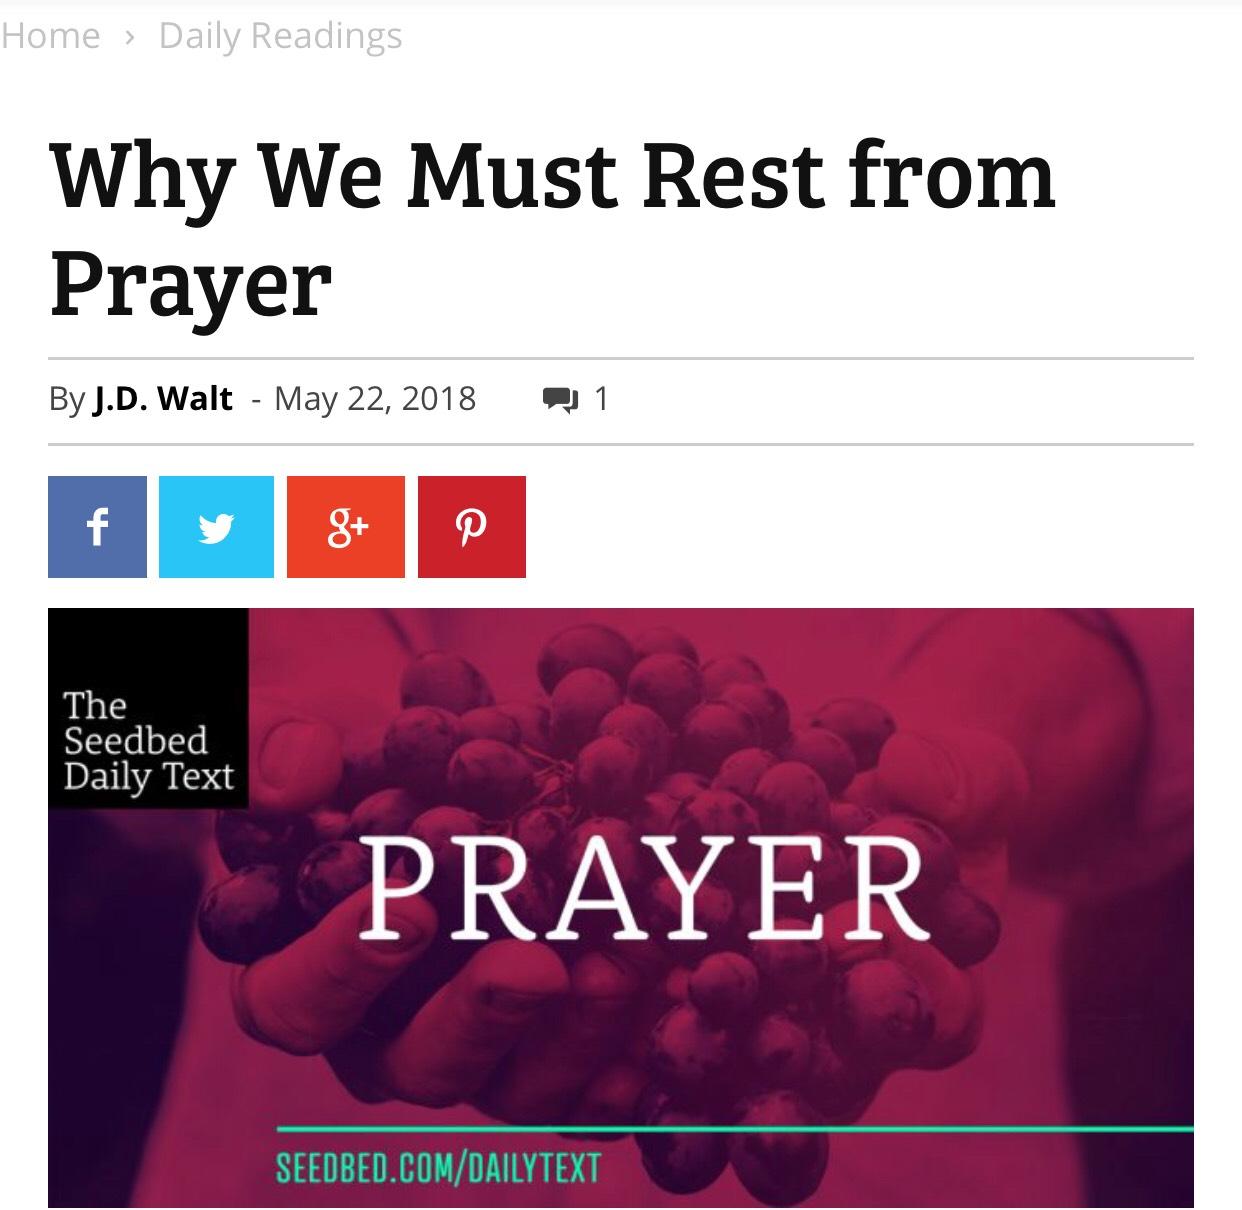 We must rest from prayer jd walt